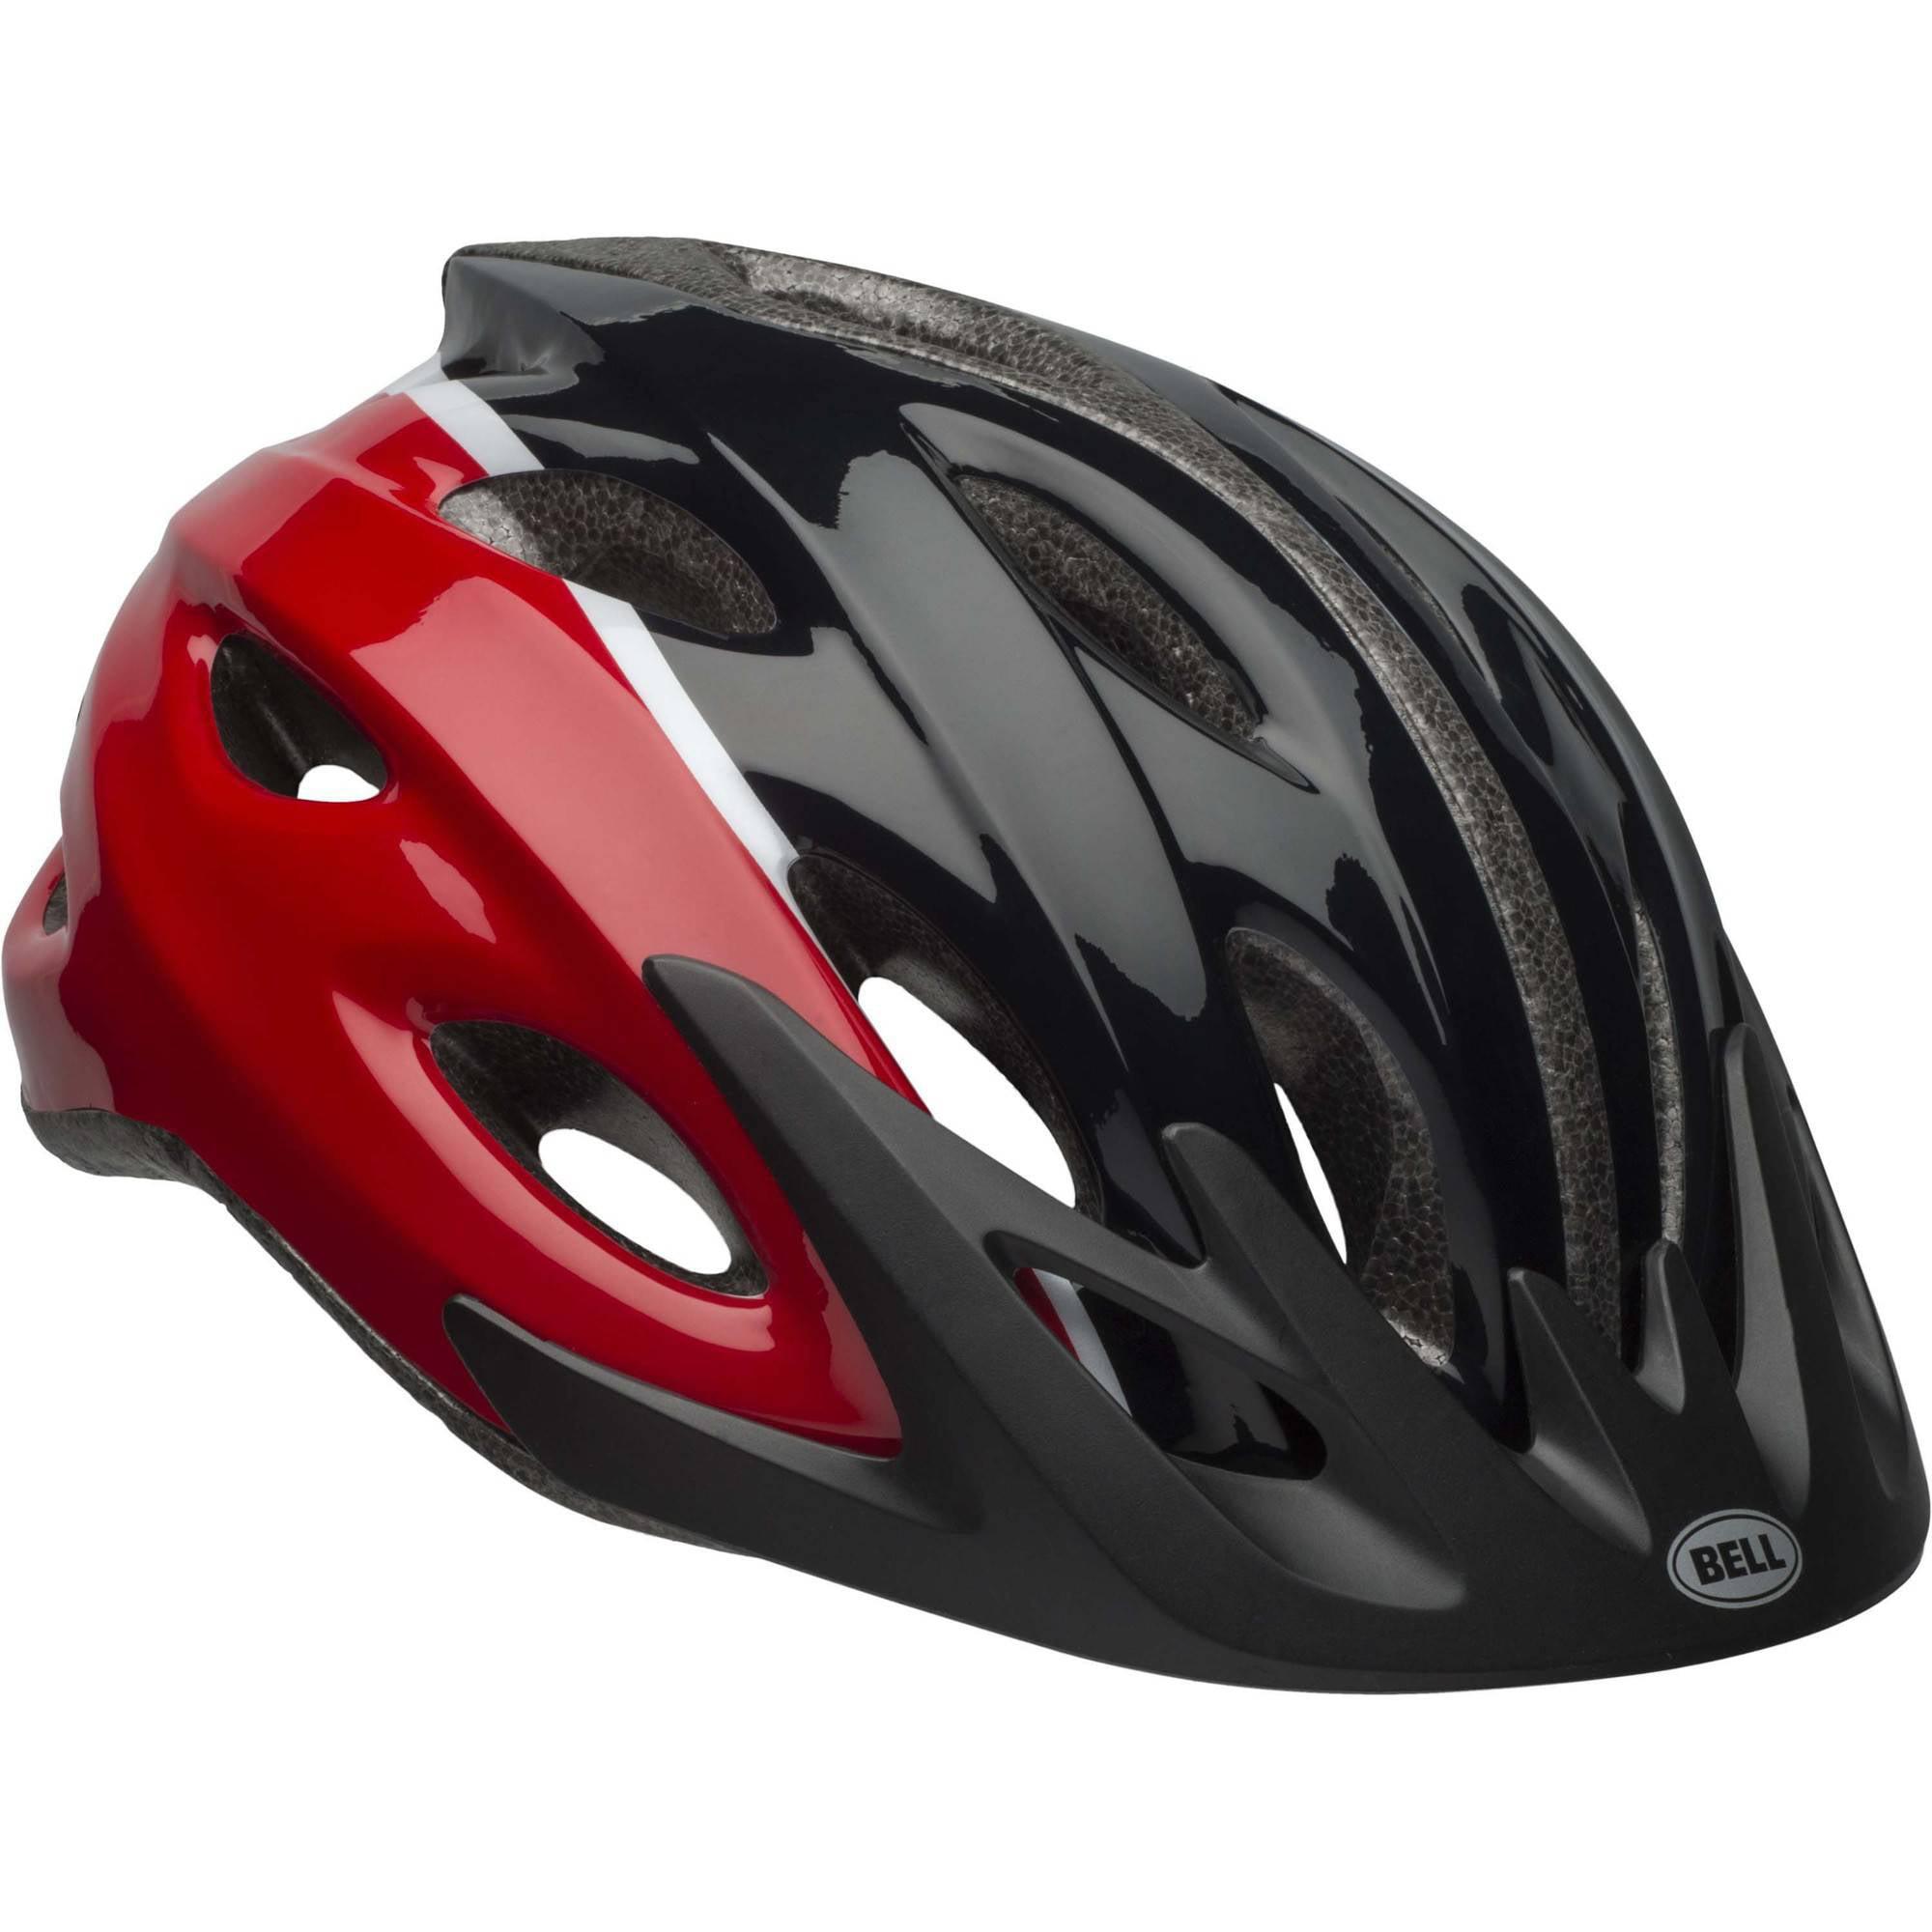 Bell Sports Ringer Slate Adult Helmet, Red and Black